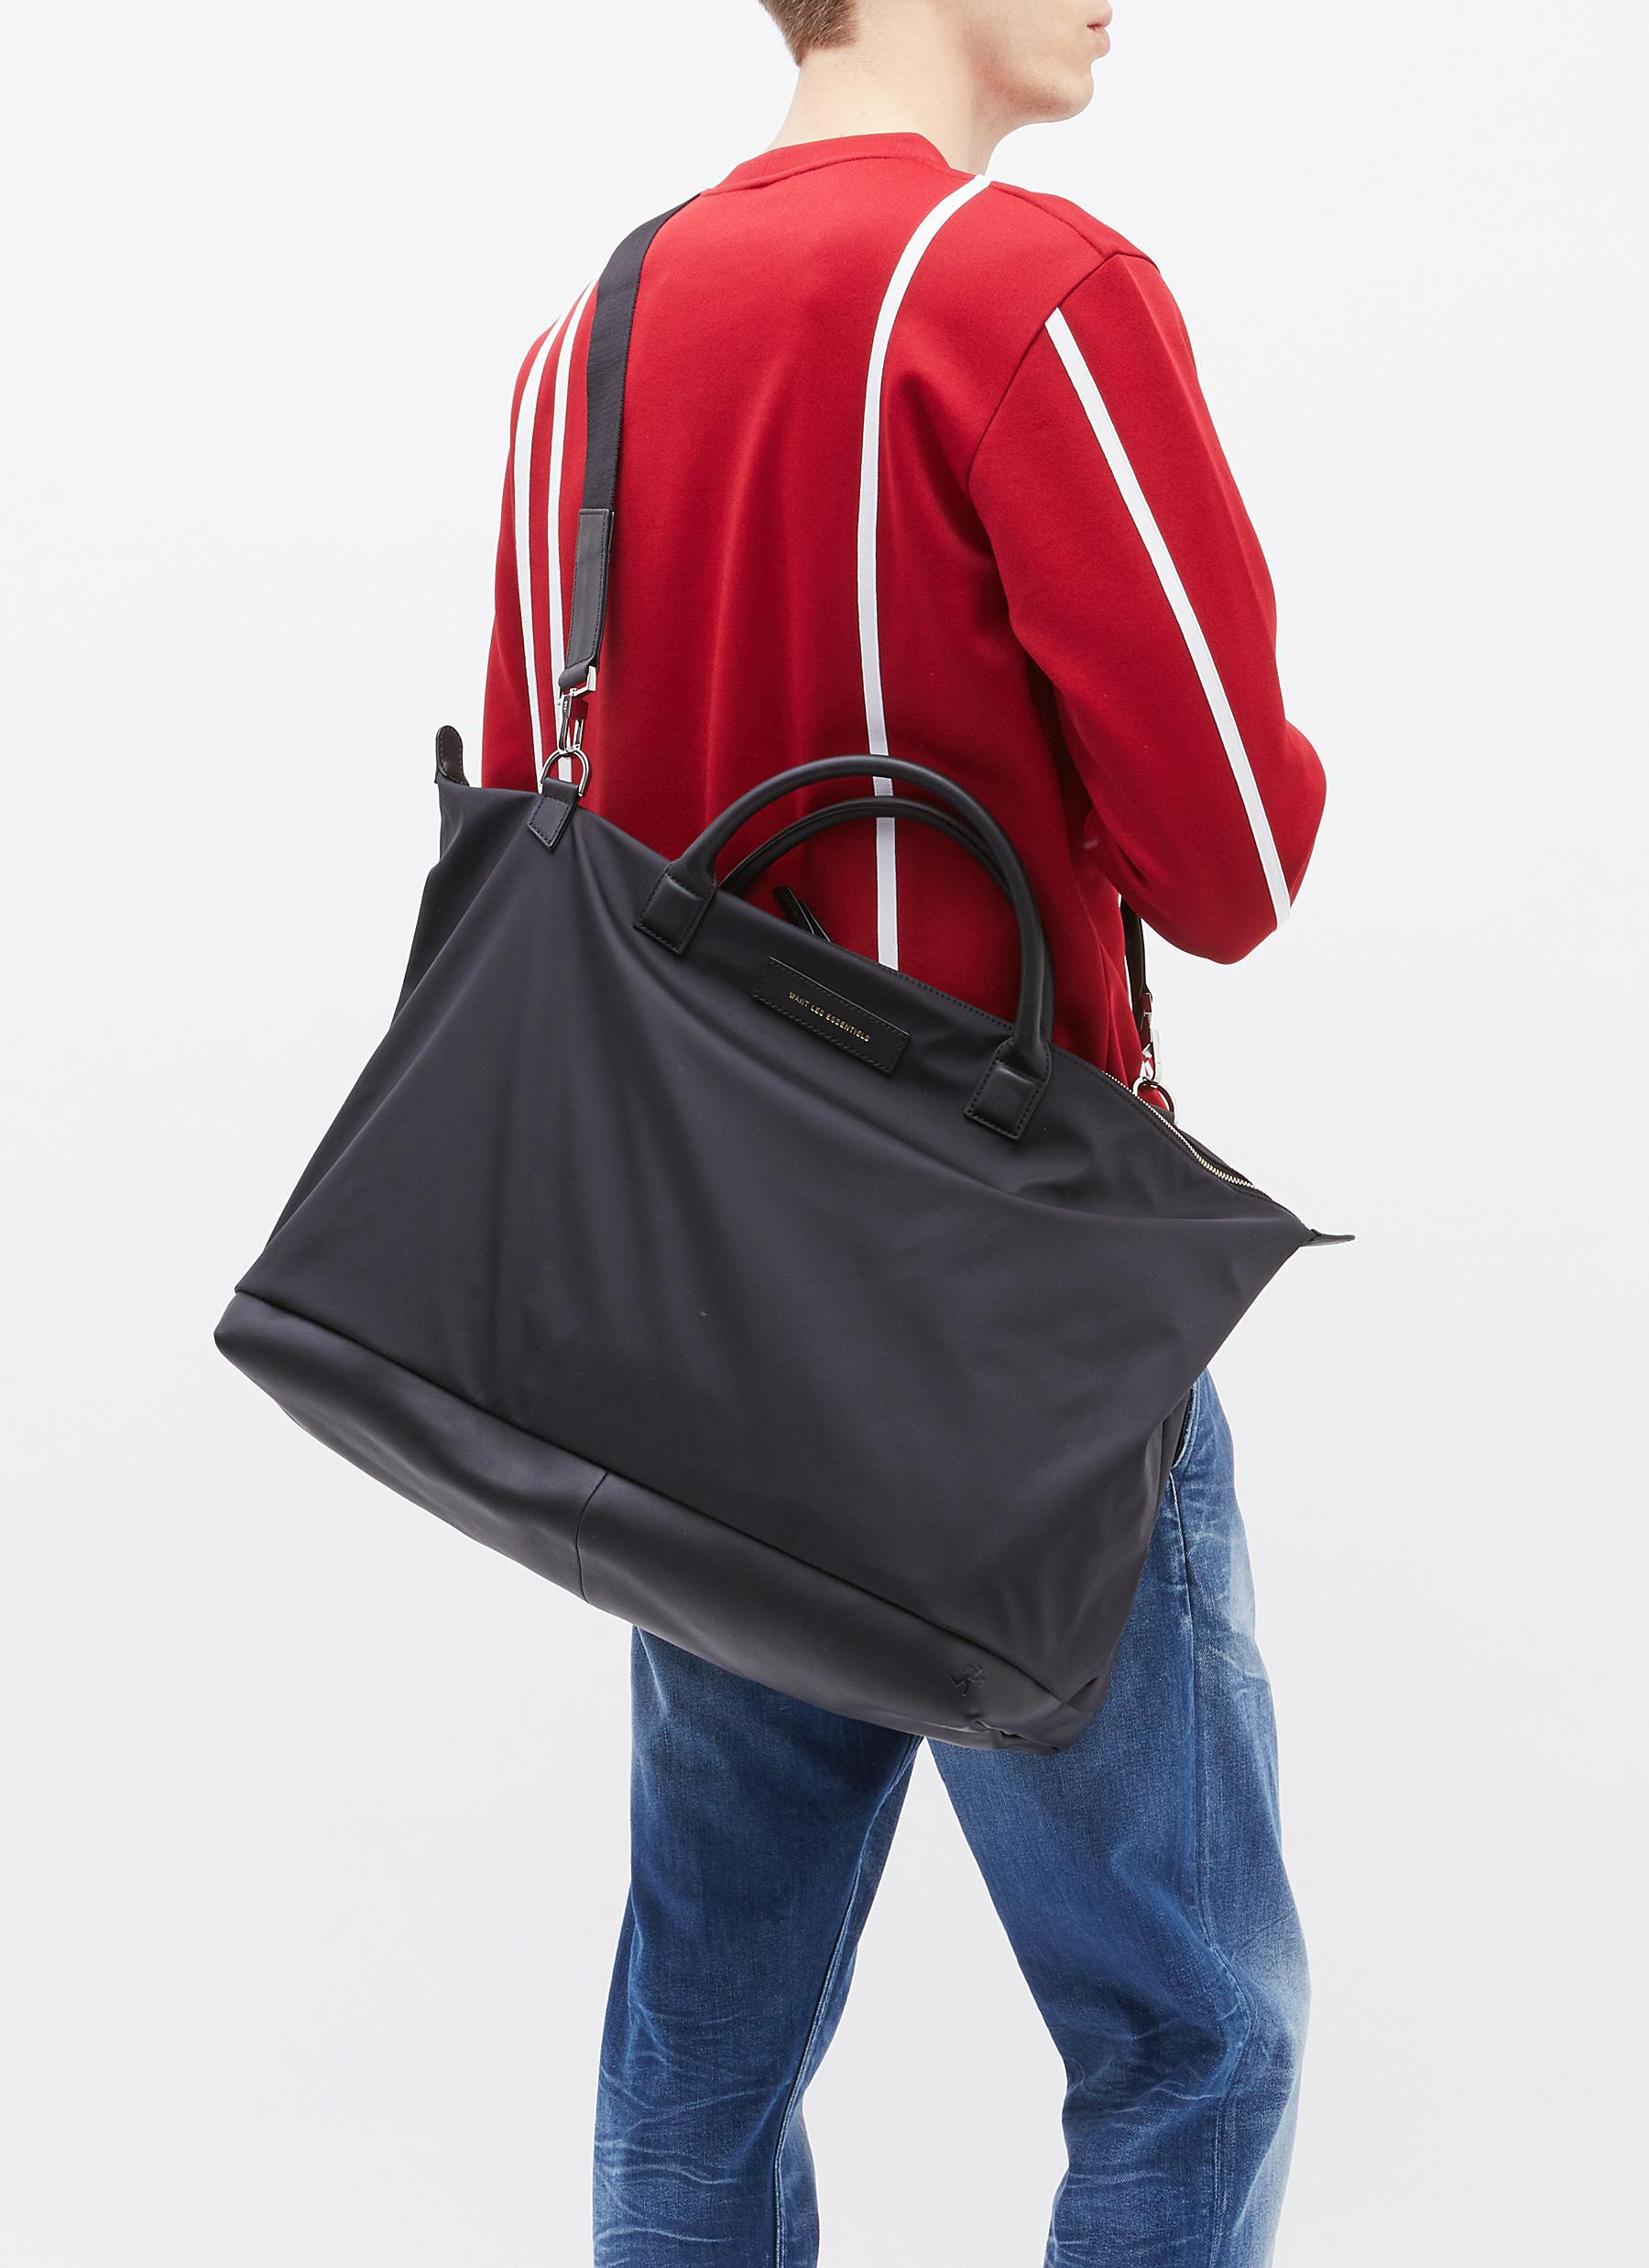 Want Les Essentiels De La Vie  hartsfield  Weekender Tote Bag for ... c0d5f23dd3e56